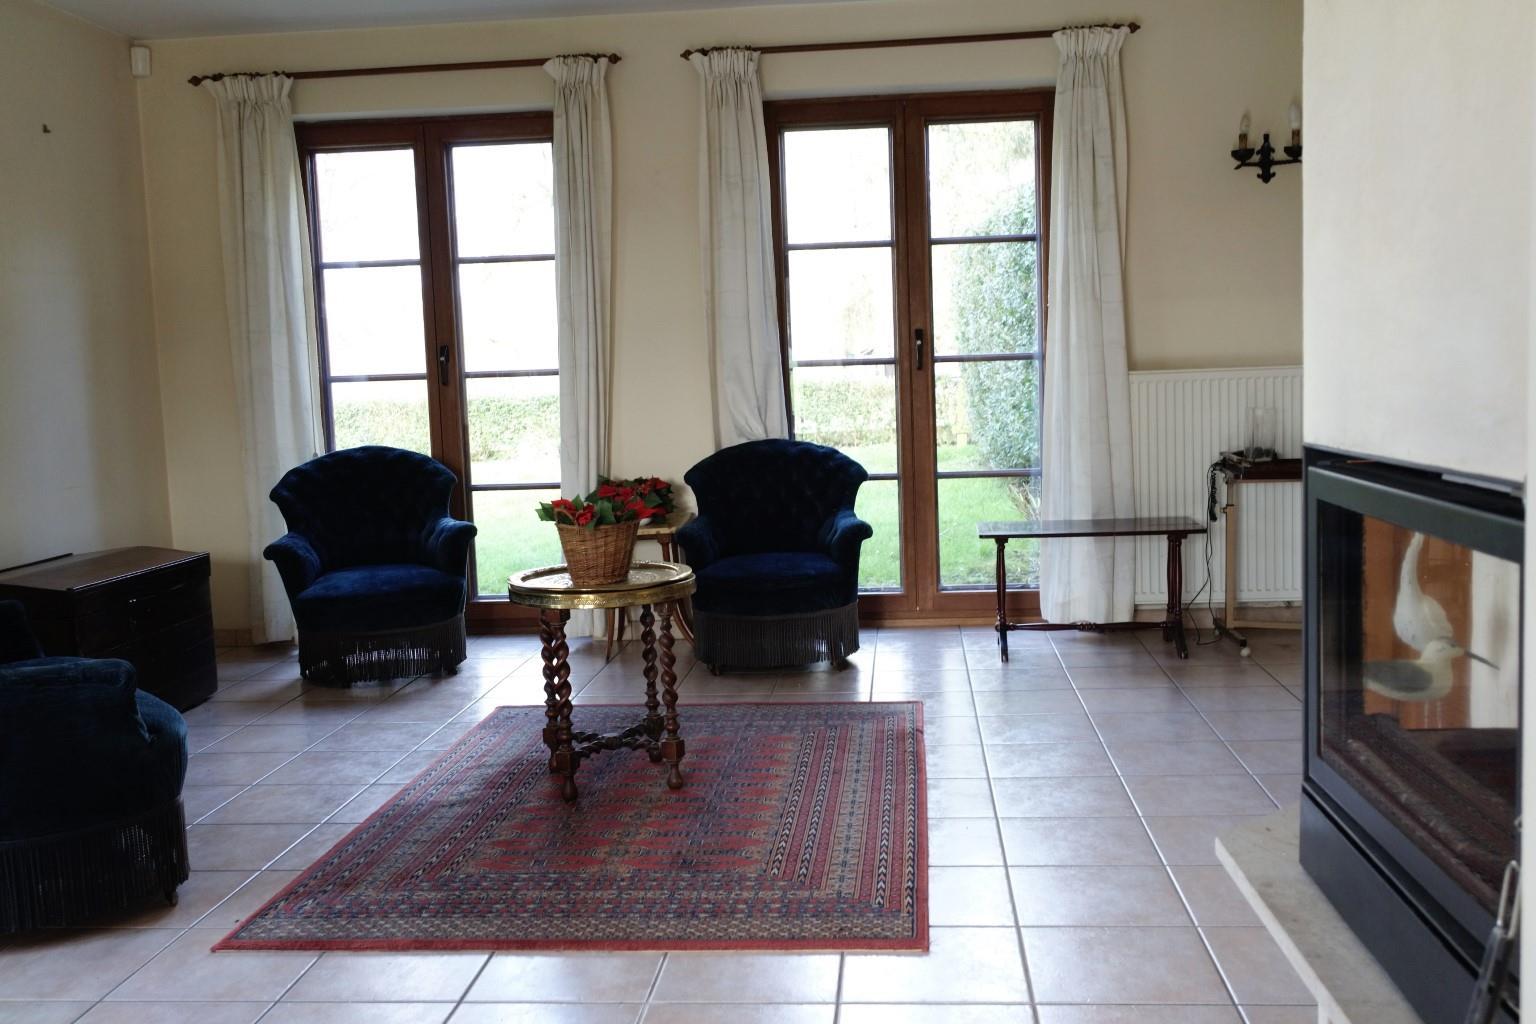 Villa - Braine-le-Comte Petit-Roeulxlez-Braine - #3029346-3